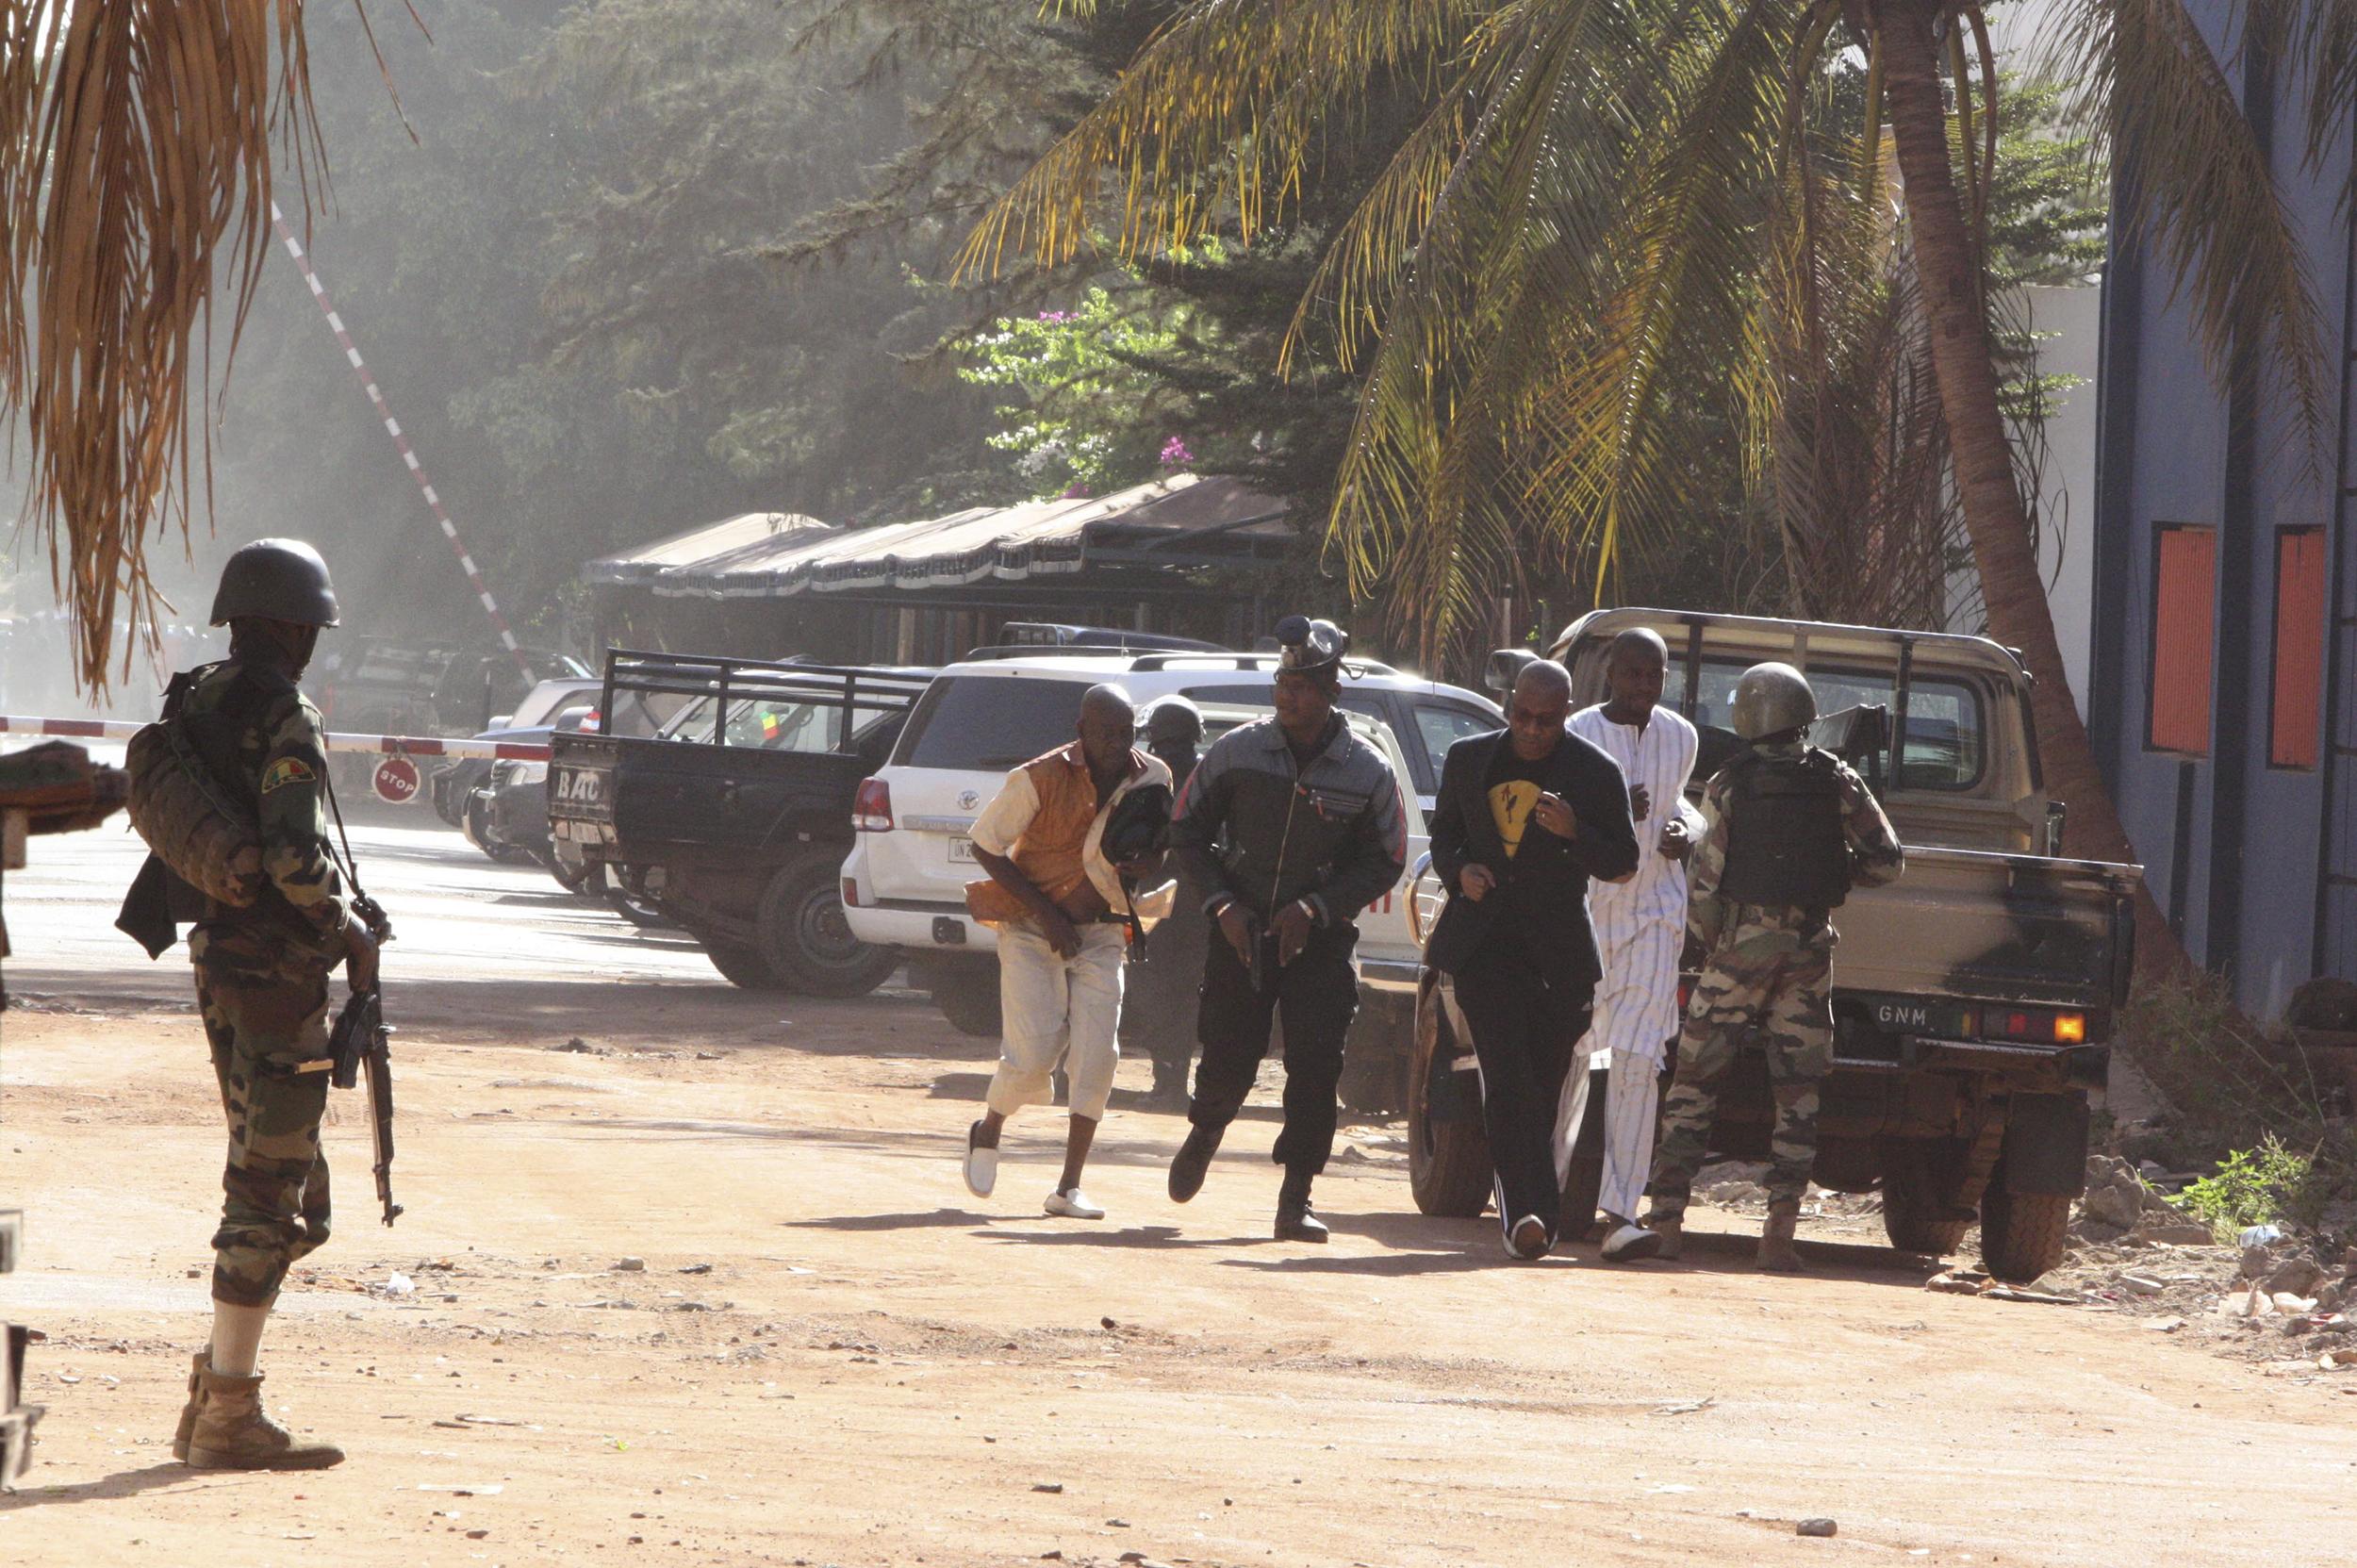 People run to flee from the Radisson Blu Hotel in Bamako, Mali on Nov. 20, 2015.